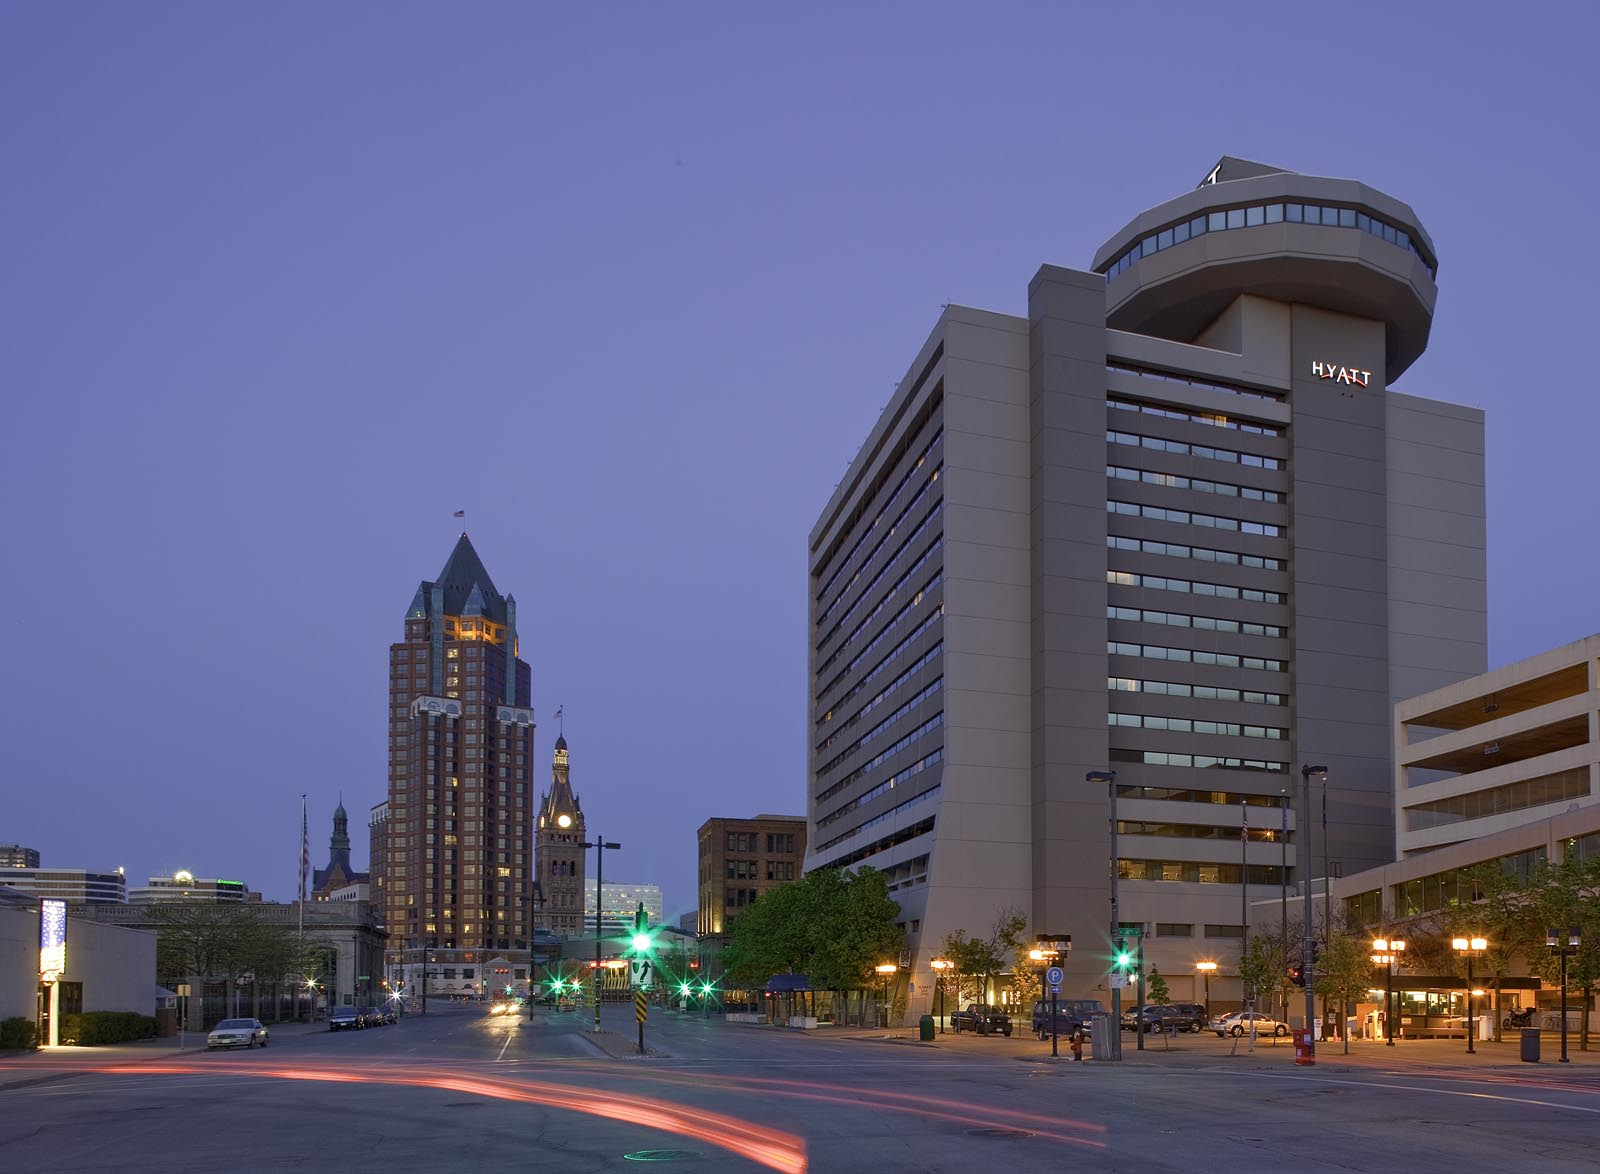 Hyatt Regency Milwaukee, WI